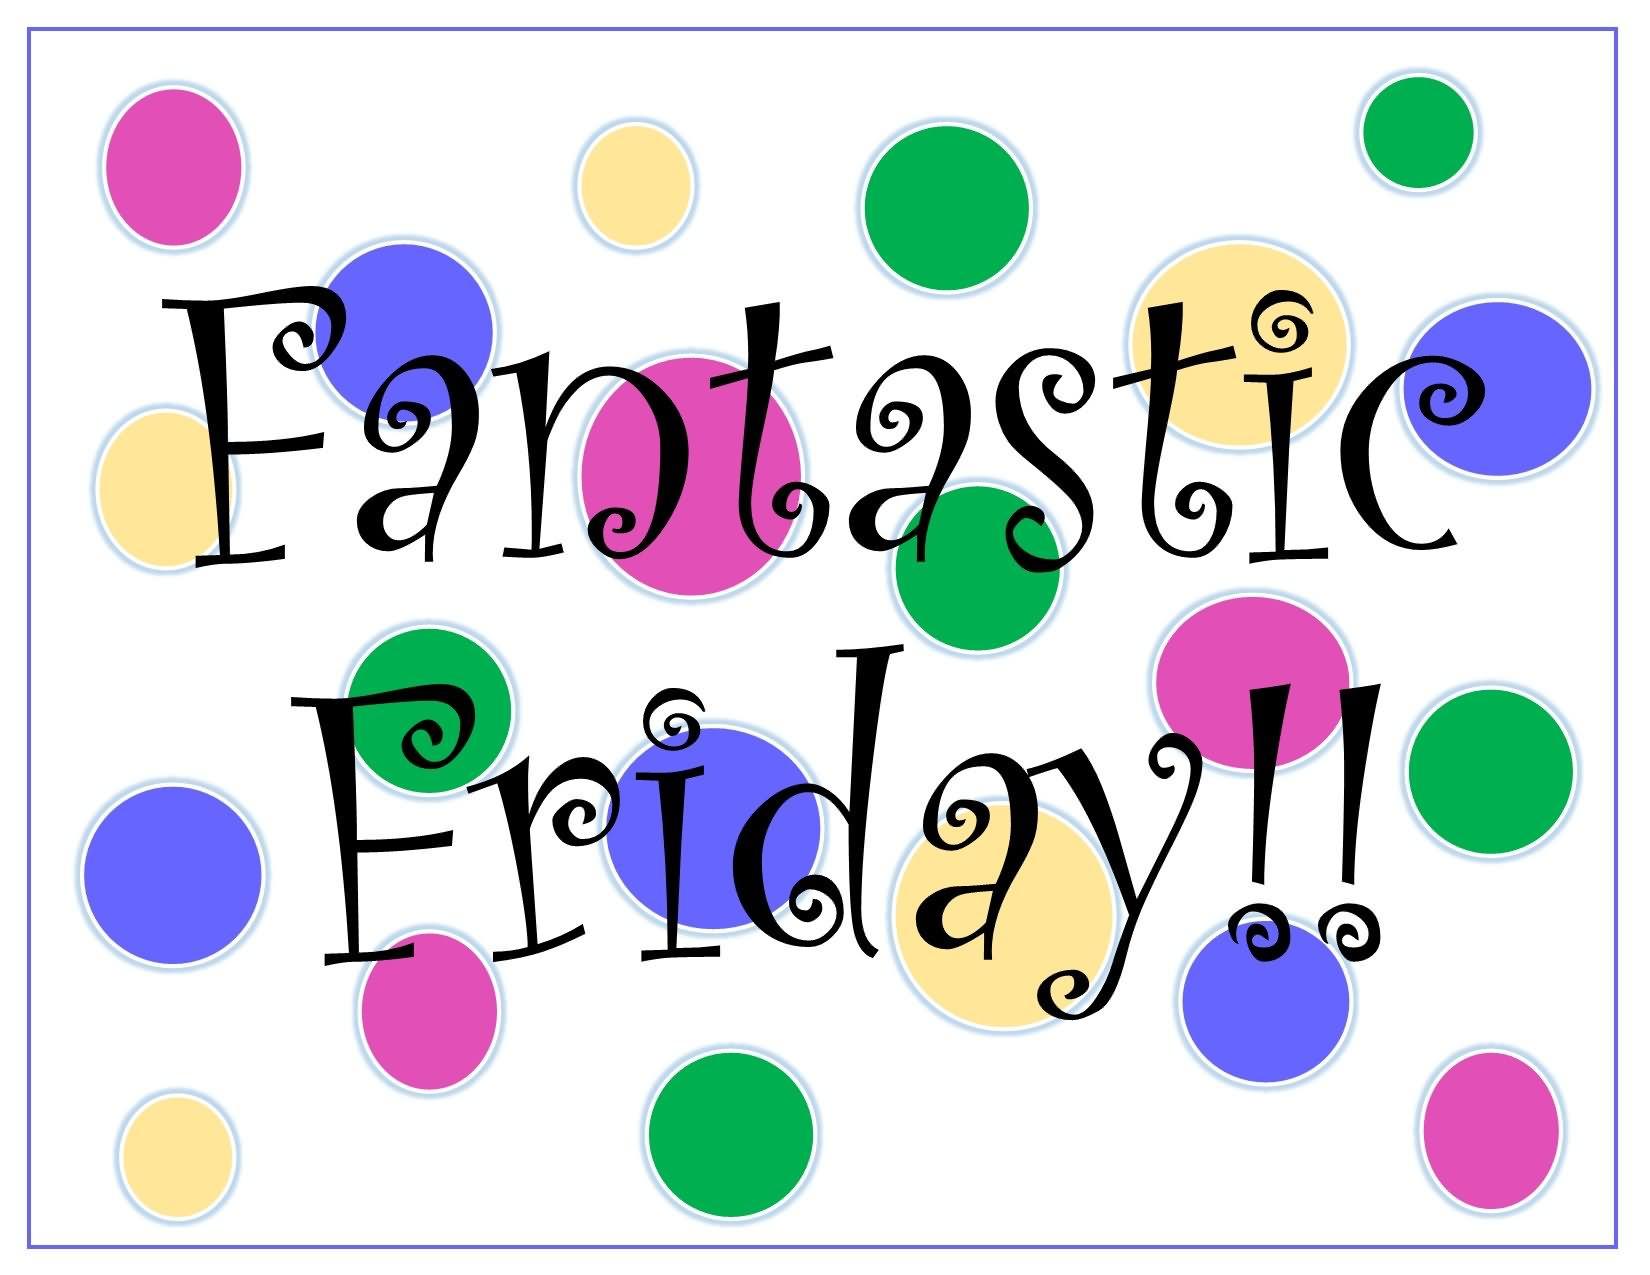 Fantastic Friday HD Wallpaper